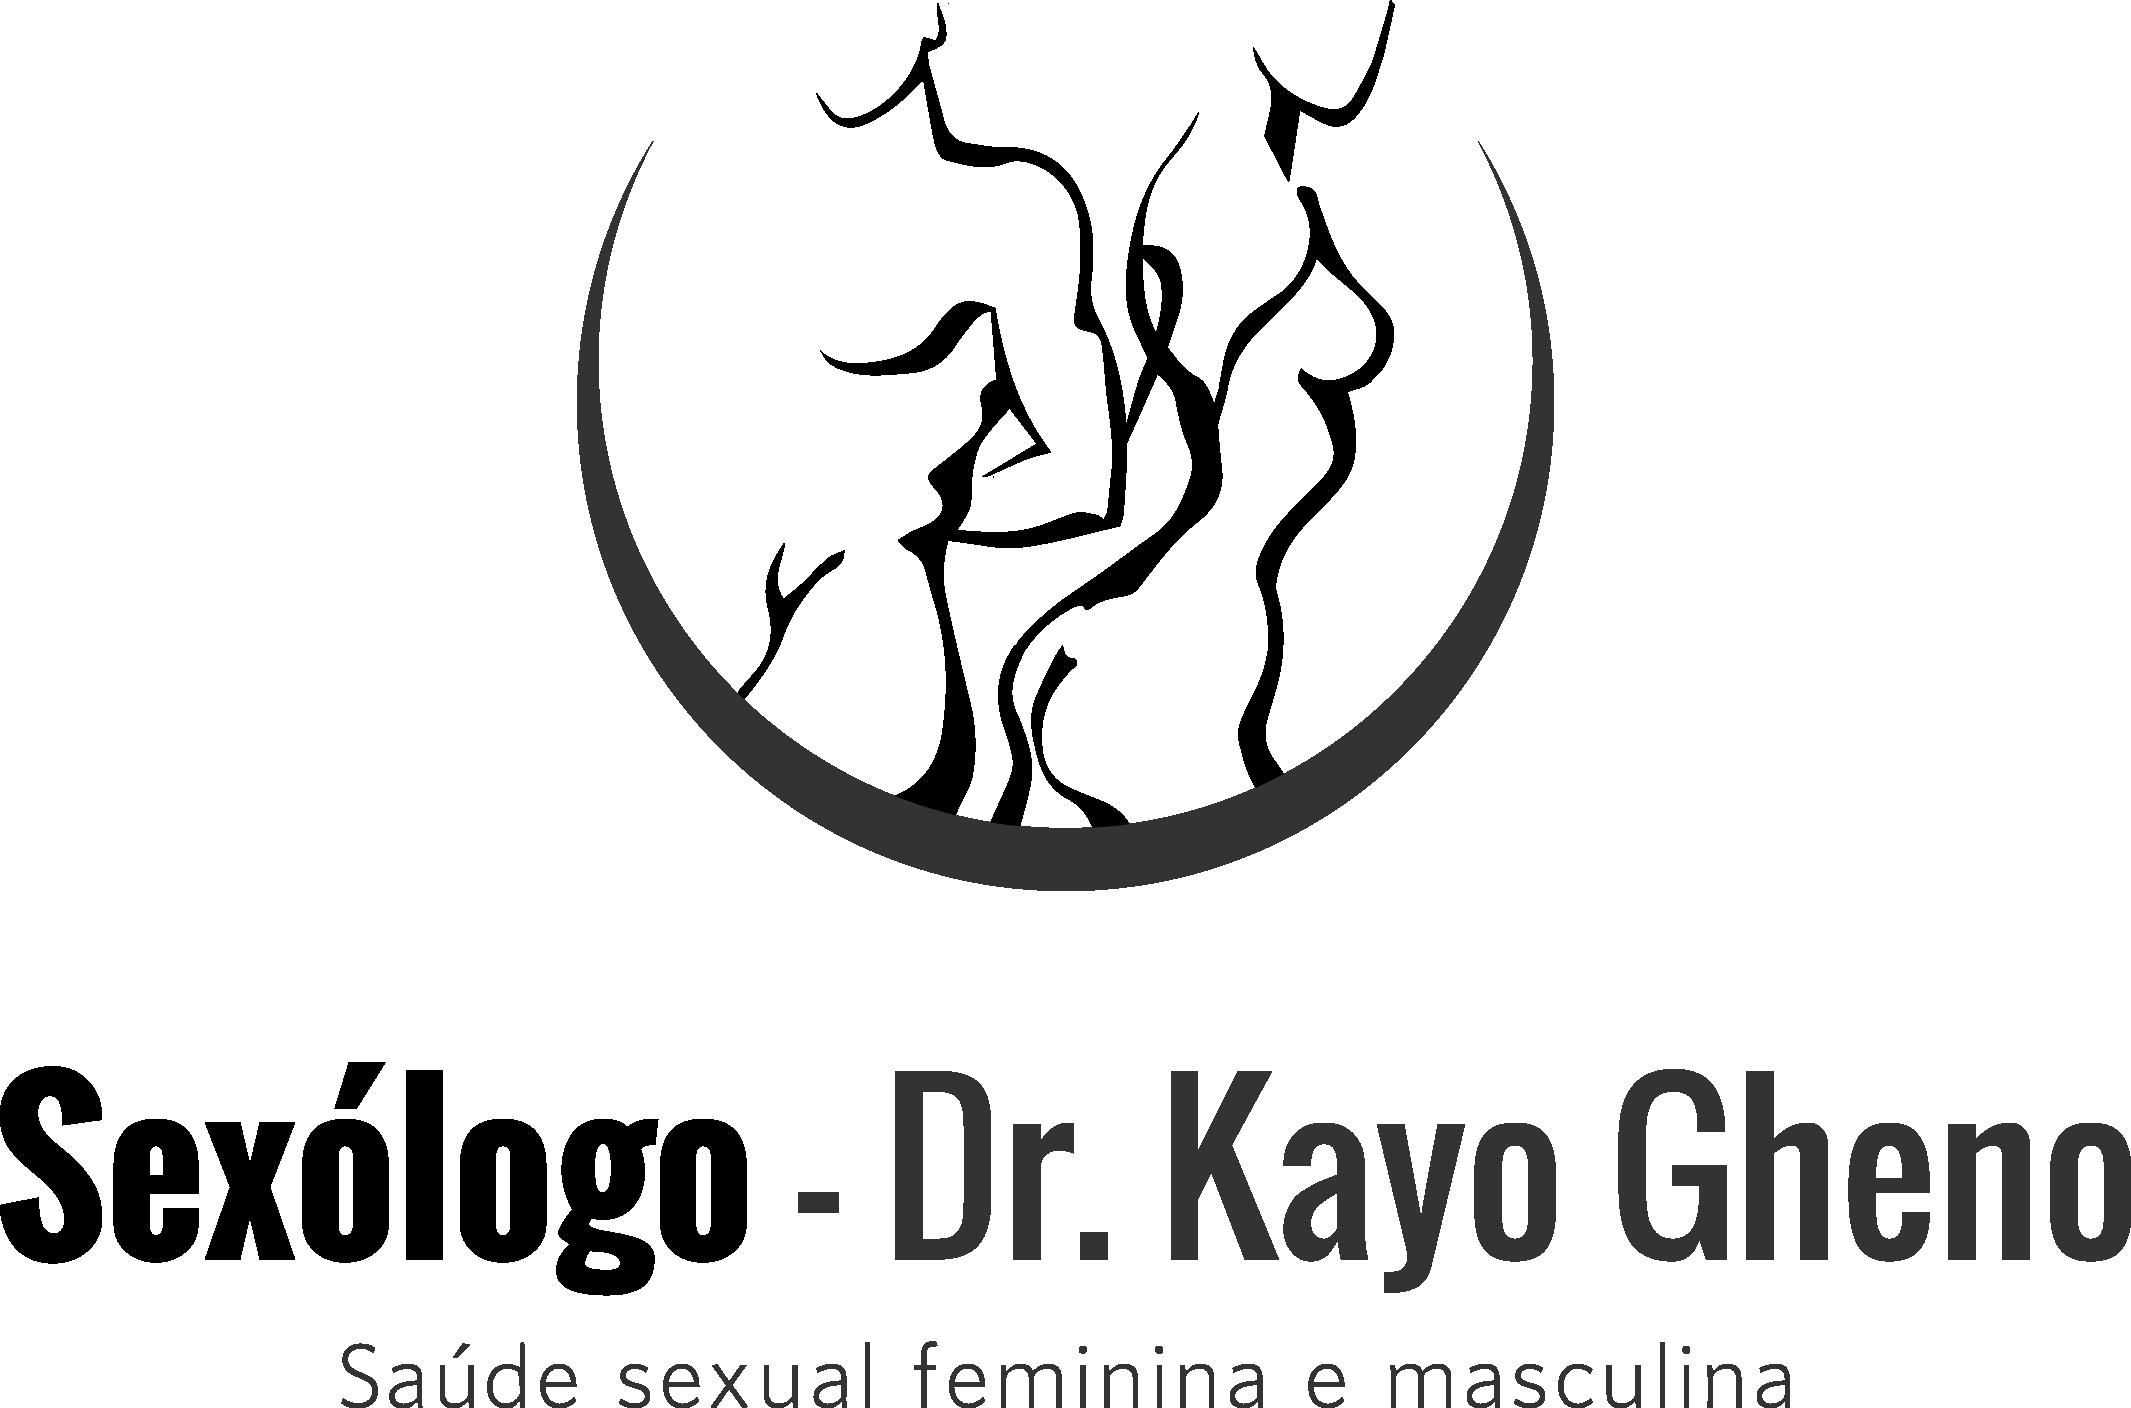 sexólogo Florianópolis sexualidade kayo gheno